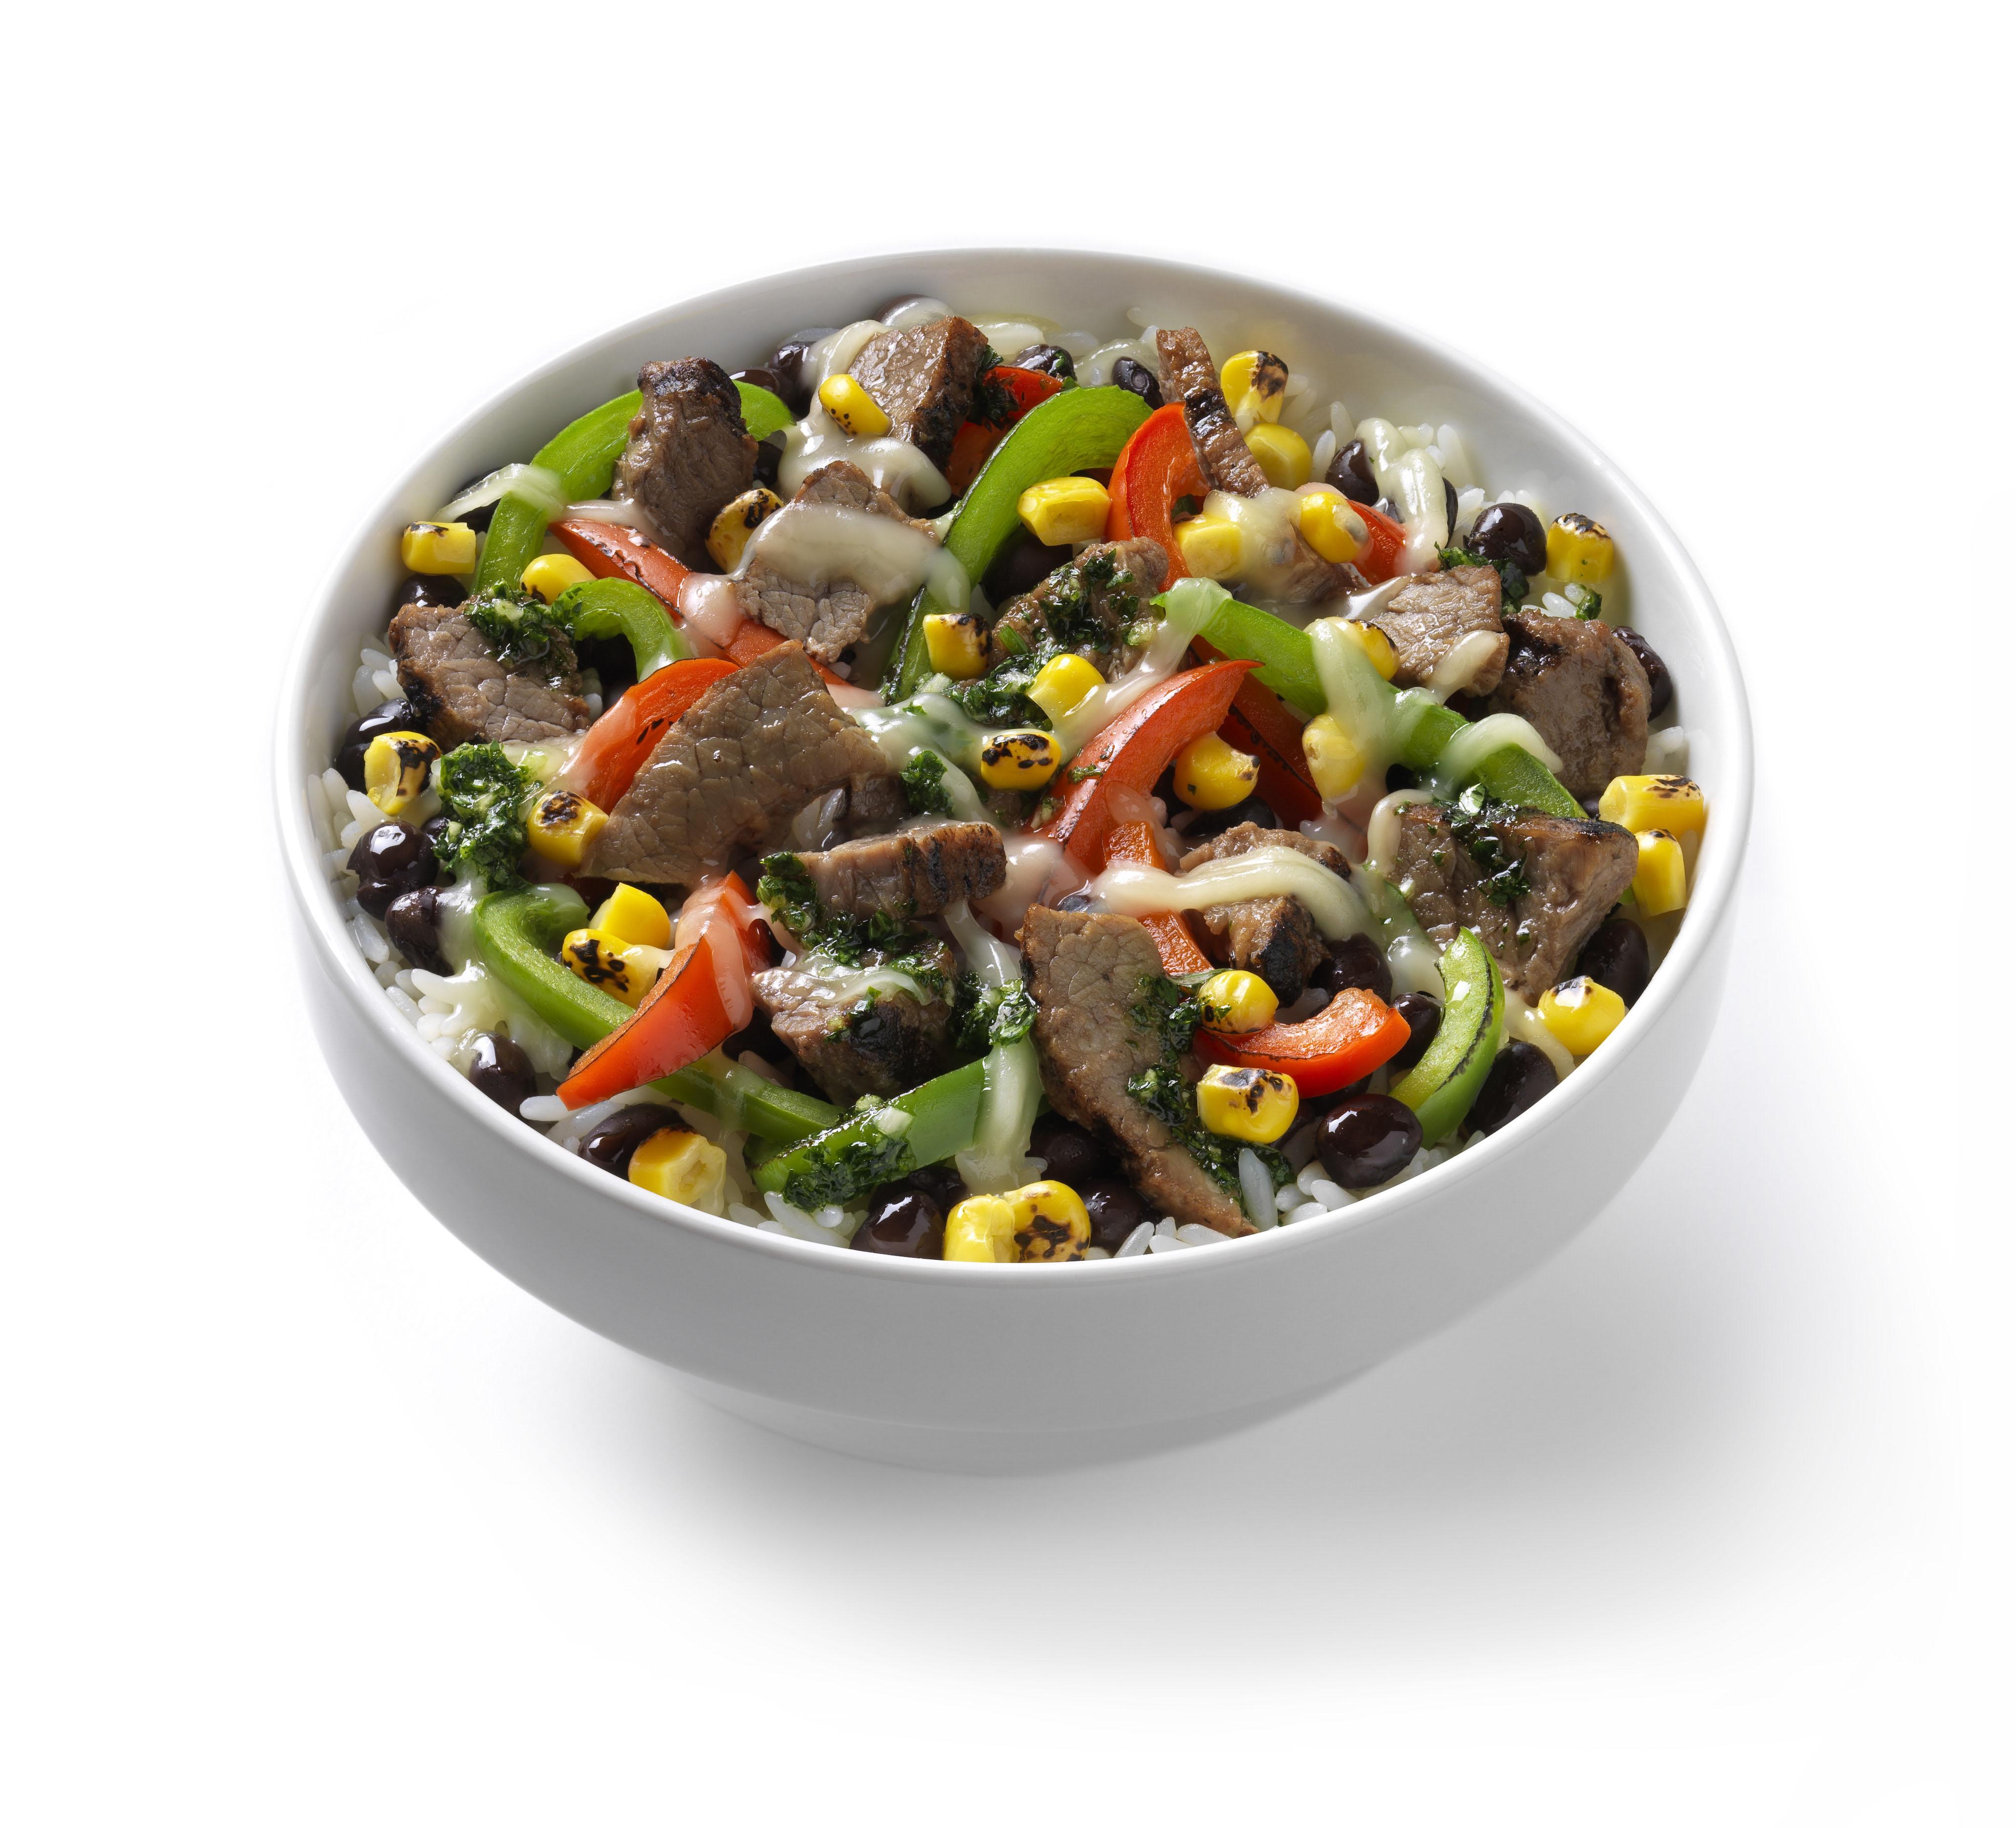 Food and Nutrition Blog: Evol Food Bowls and Burritos